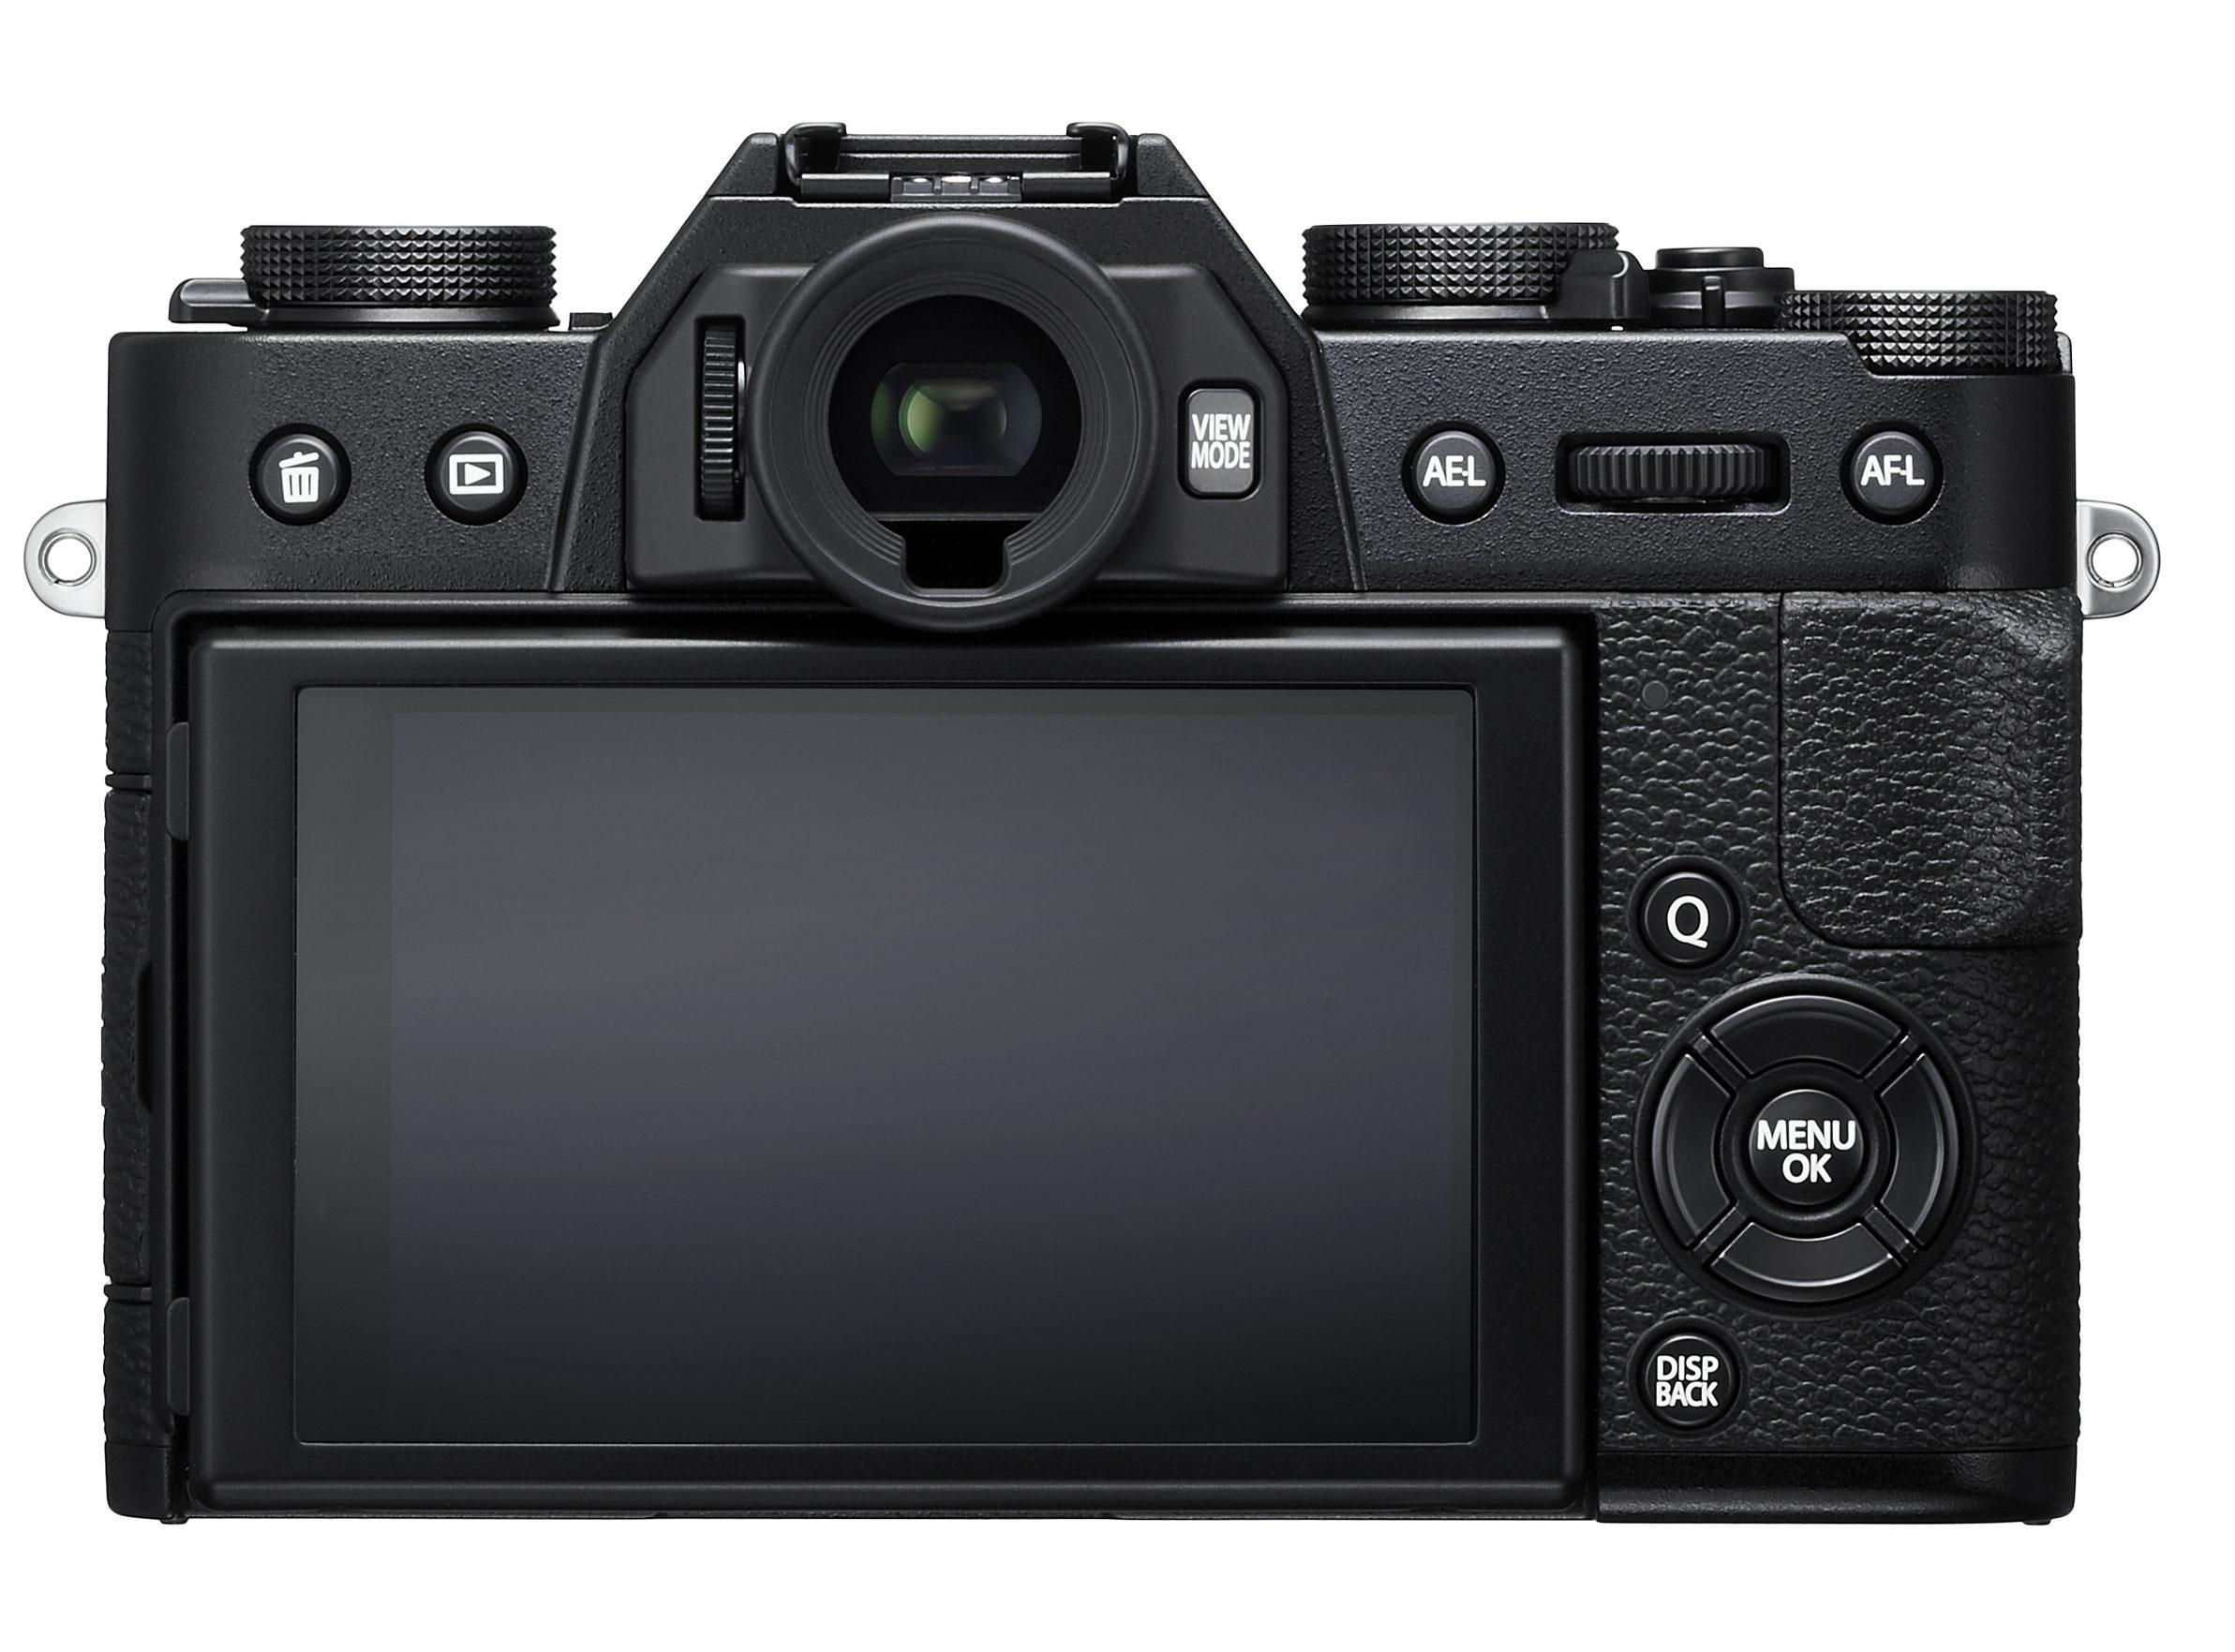 Fujifilm-x-t20-apn-hybride-x-trans